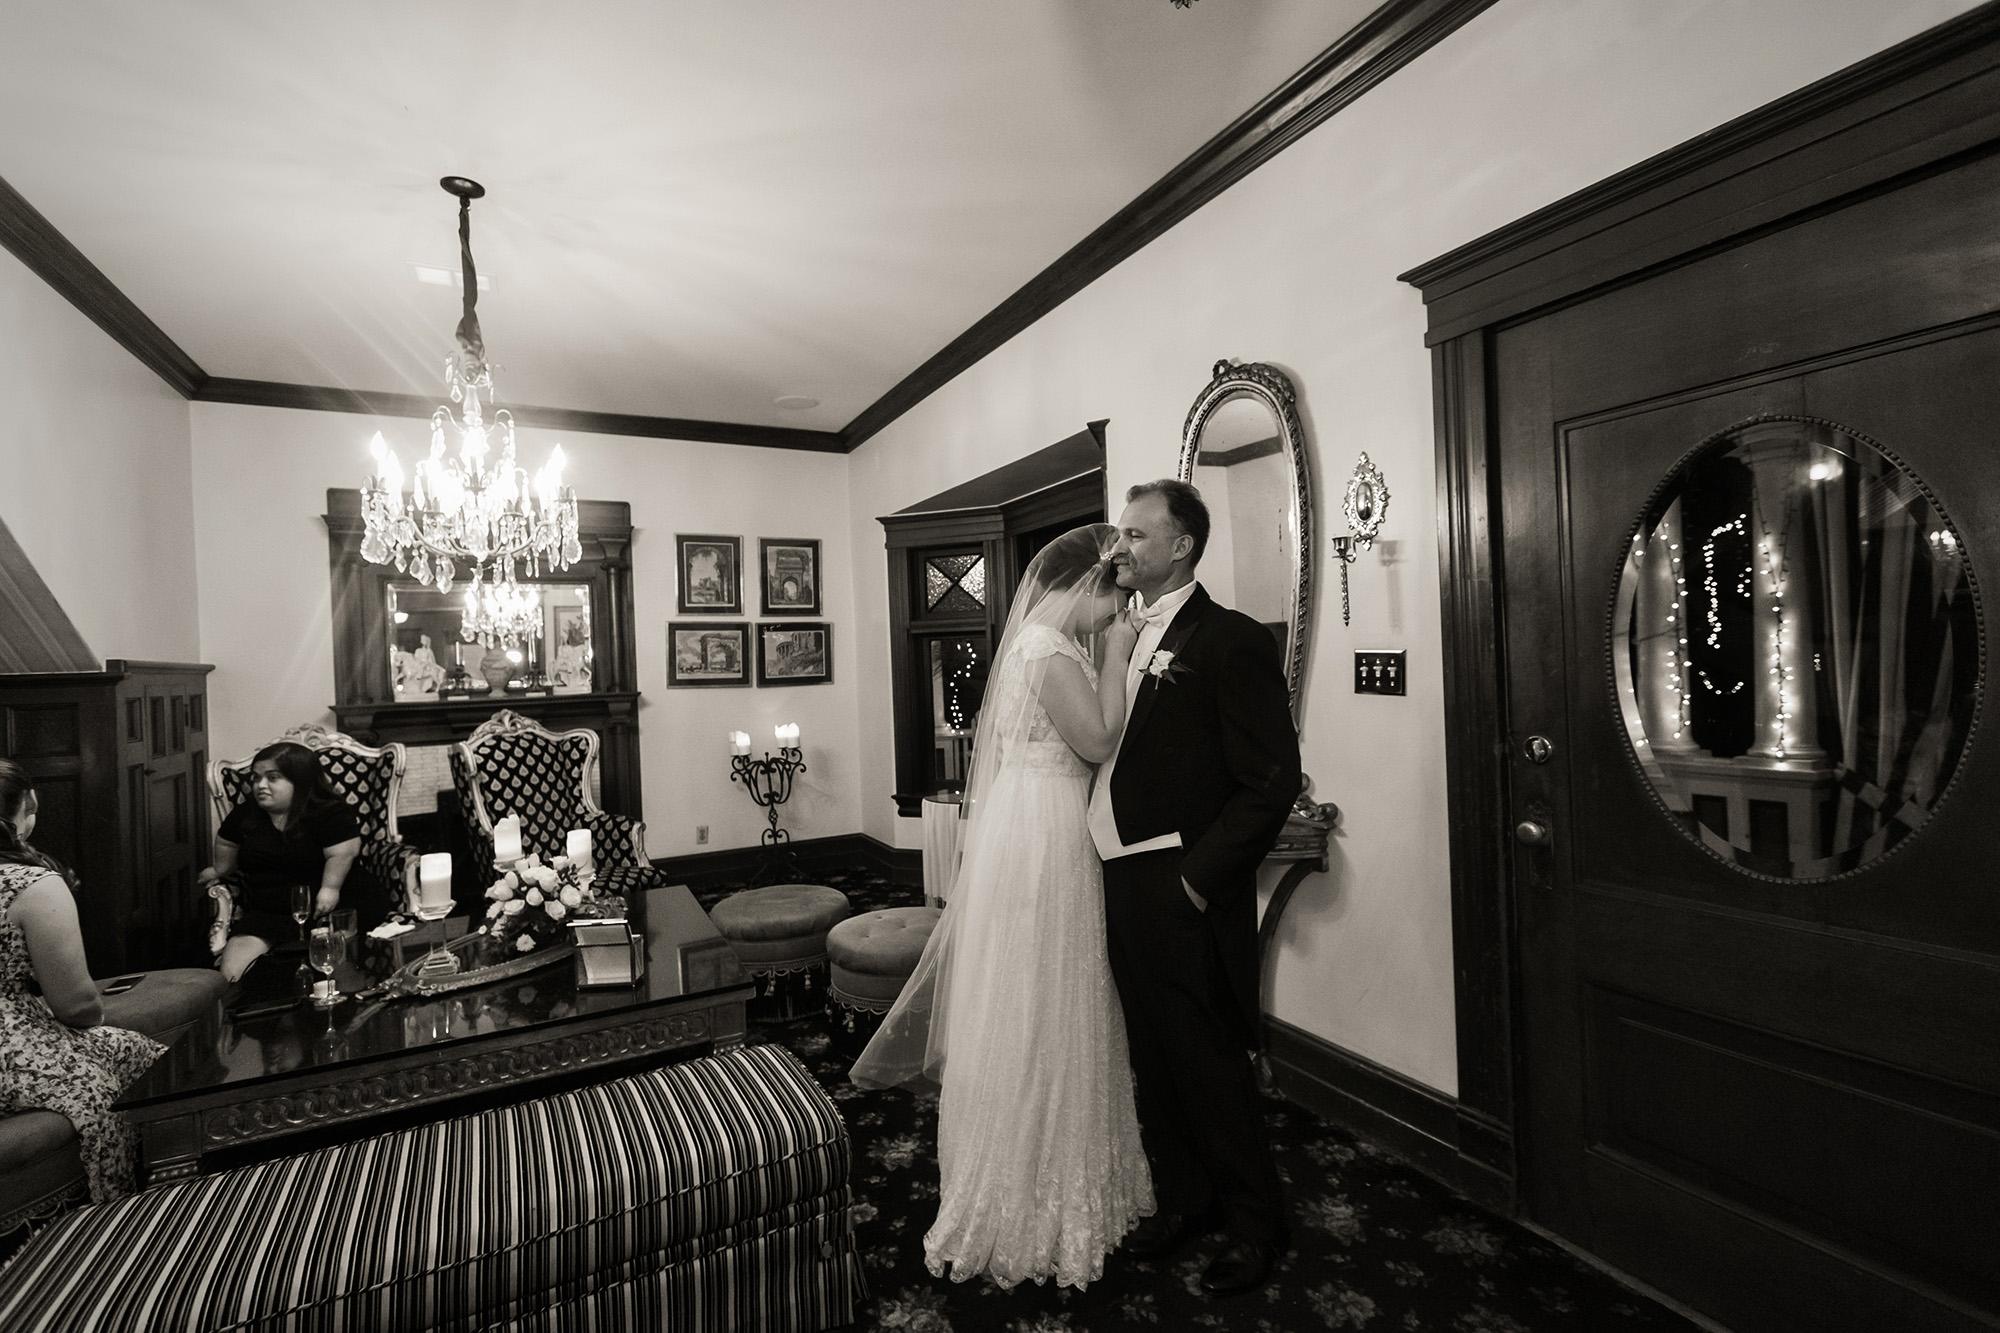 vintage-inspired-christmas-house-wedding-carrie-vines-110.jpg